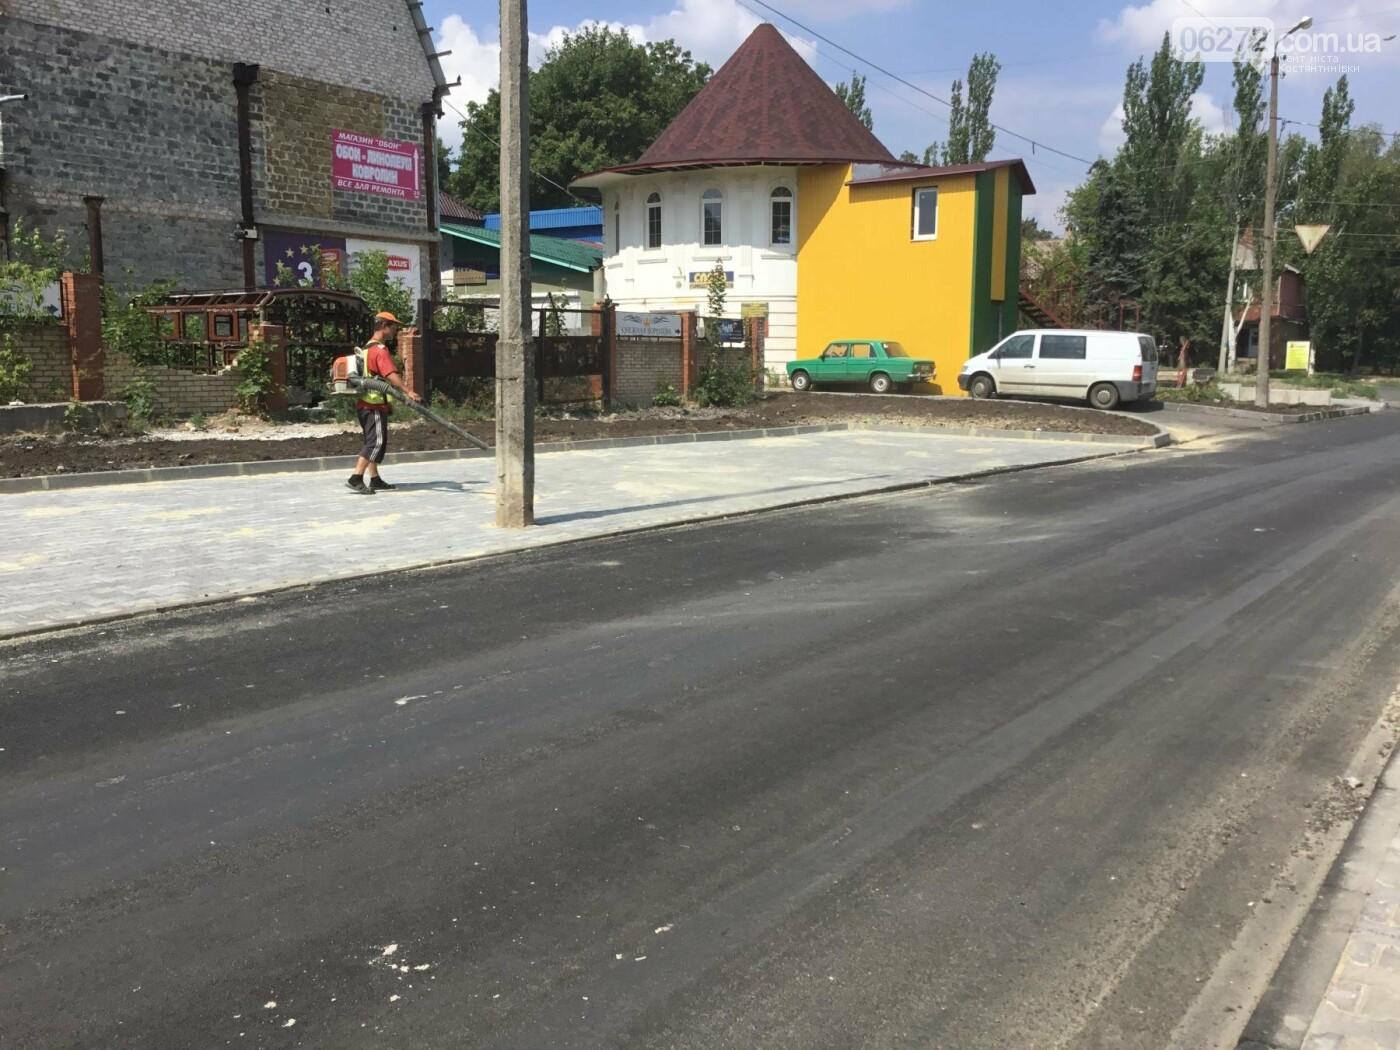 В Константиновке продолжают ремонт дорог, фото-5